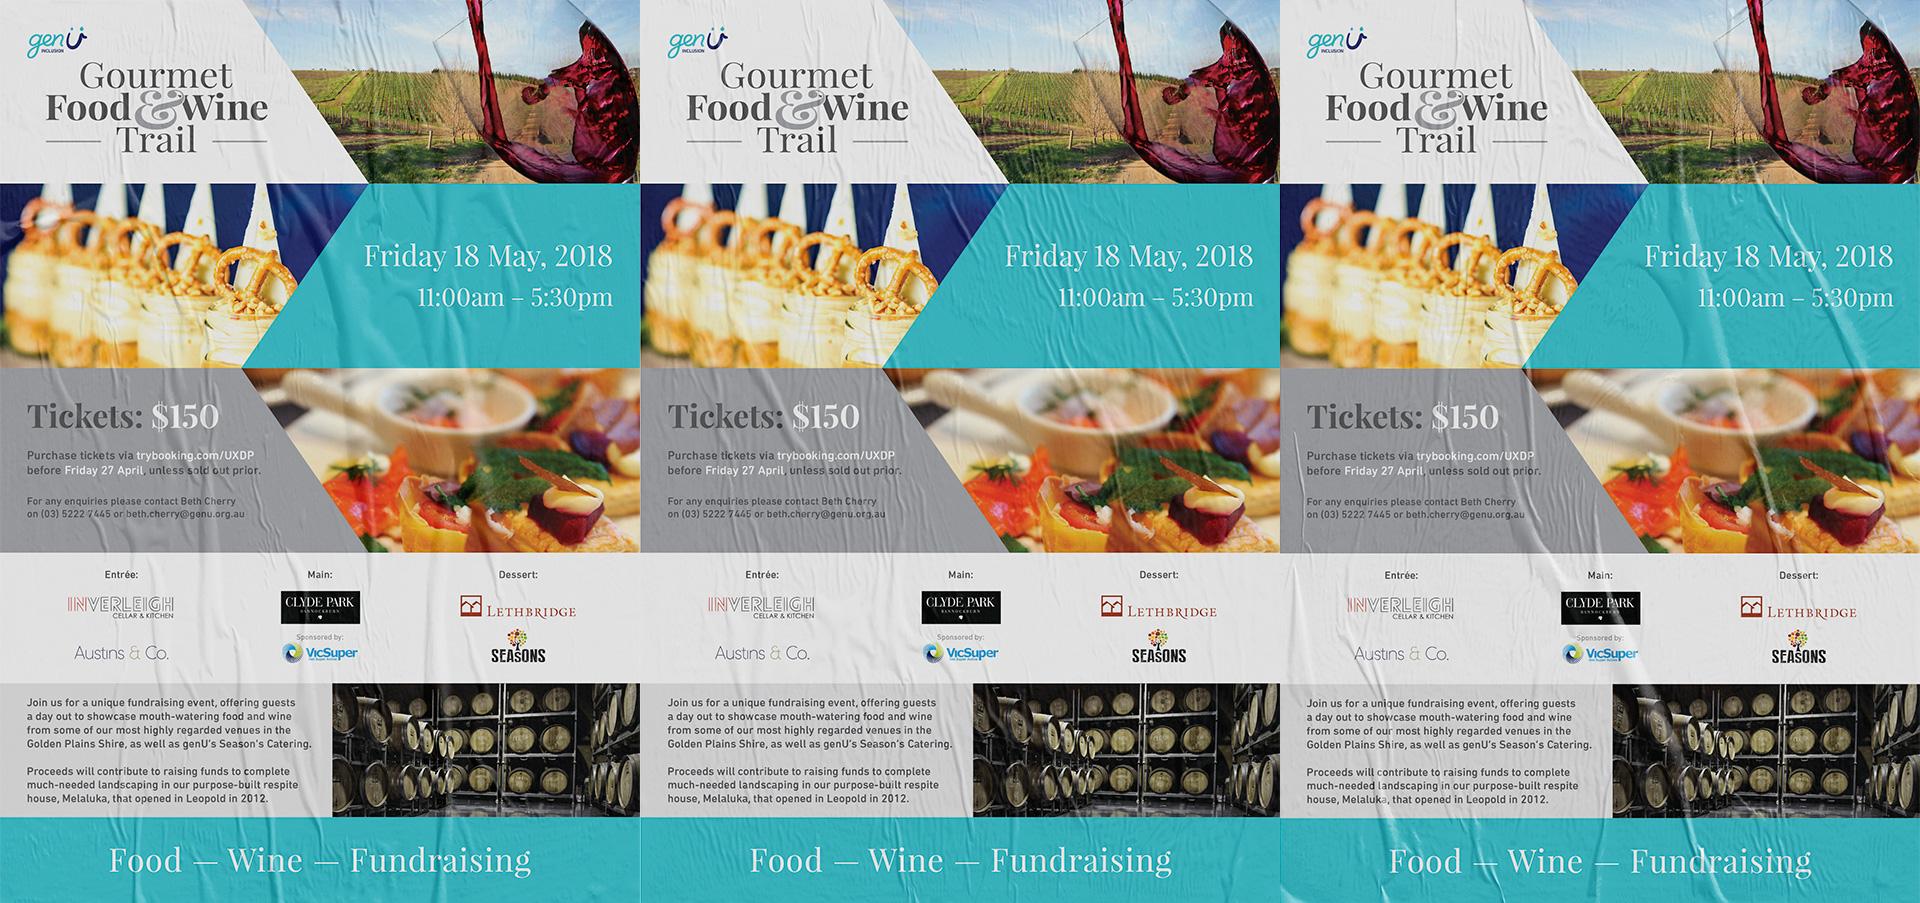 genU Gourmet Food & Wine Trail 2018 fundraiser poster